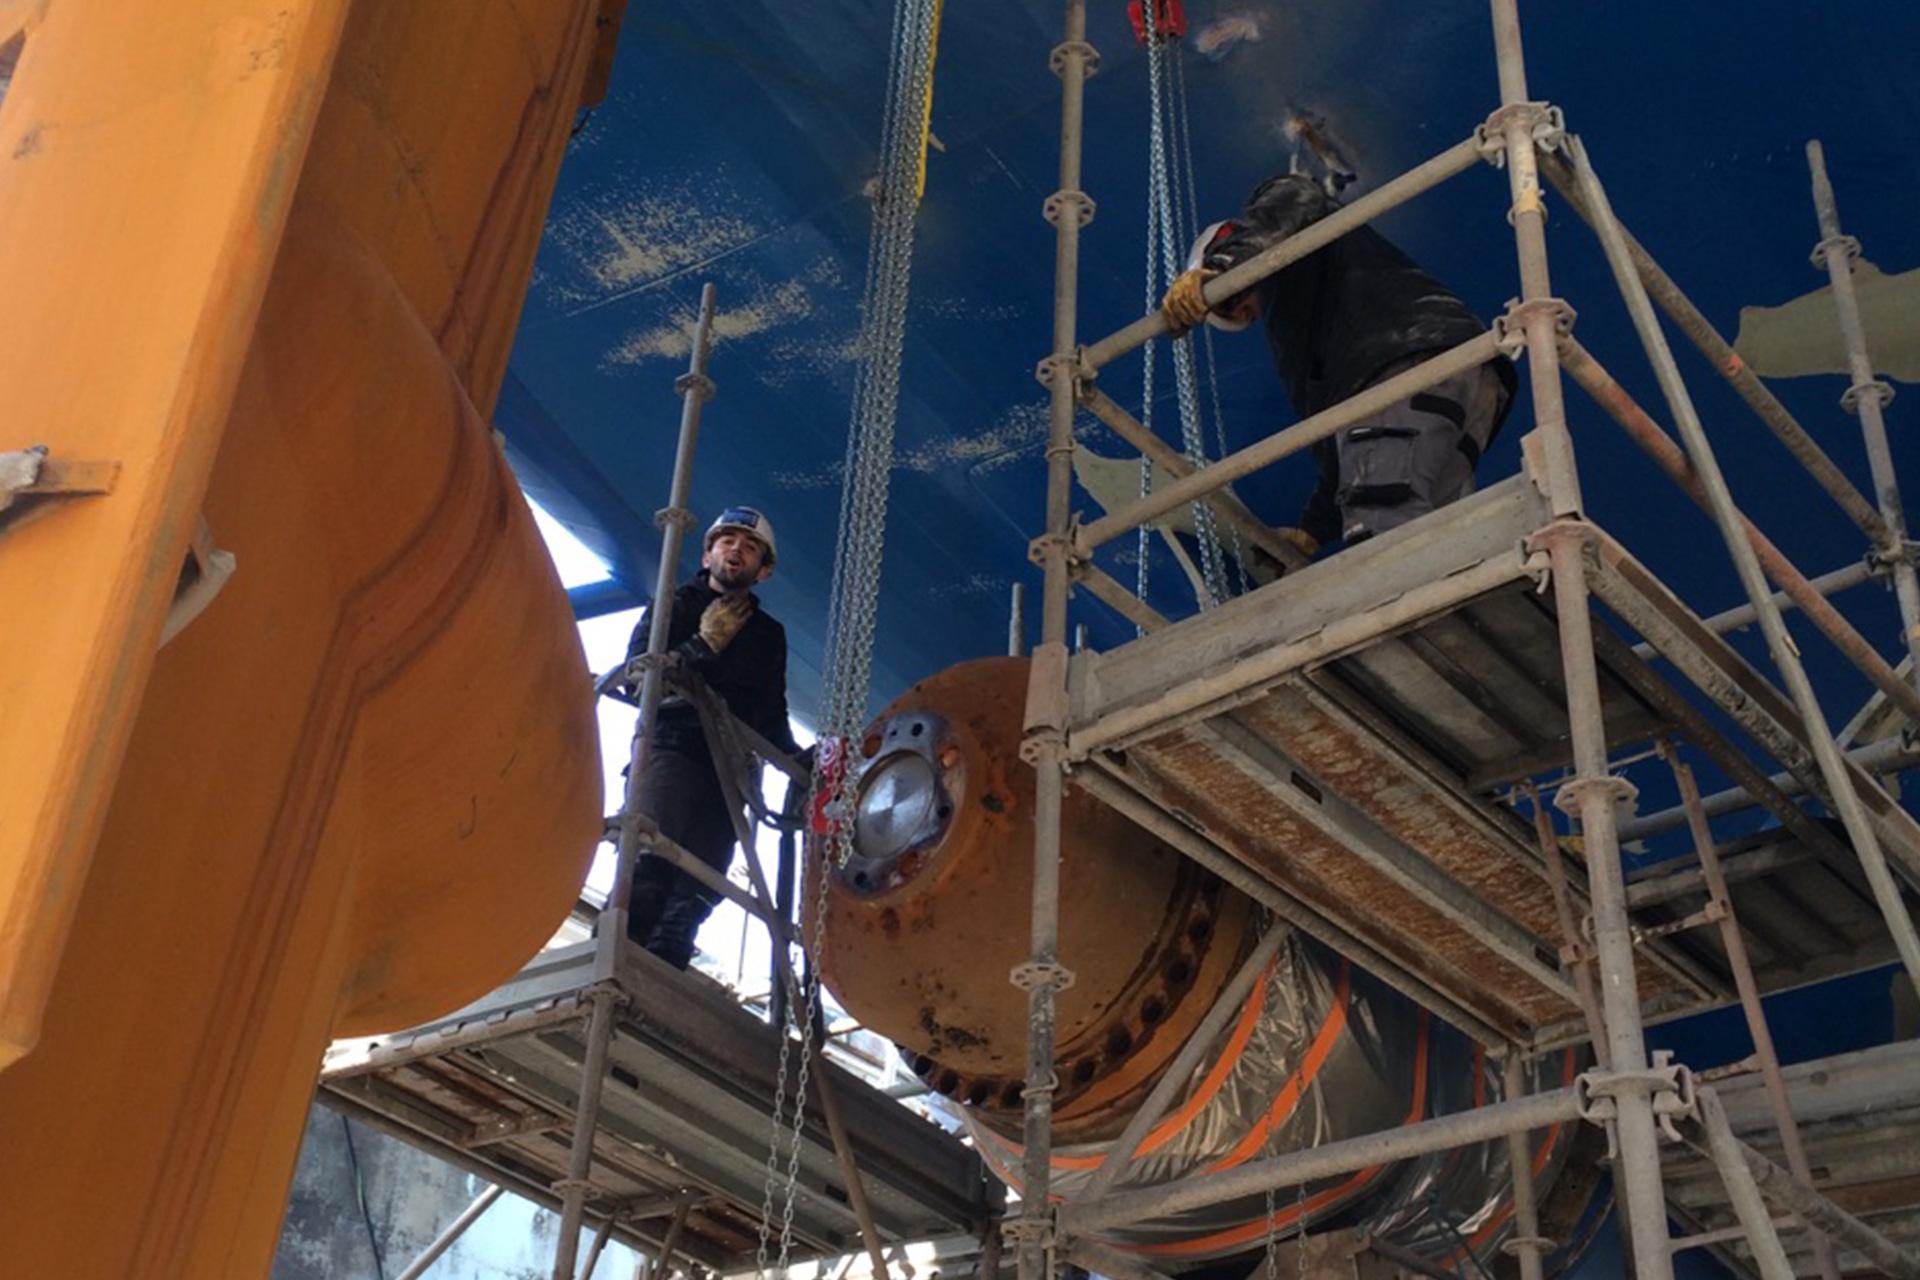 manutention-levage-navale-bateau-4